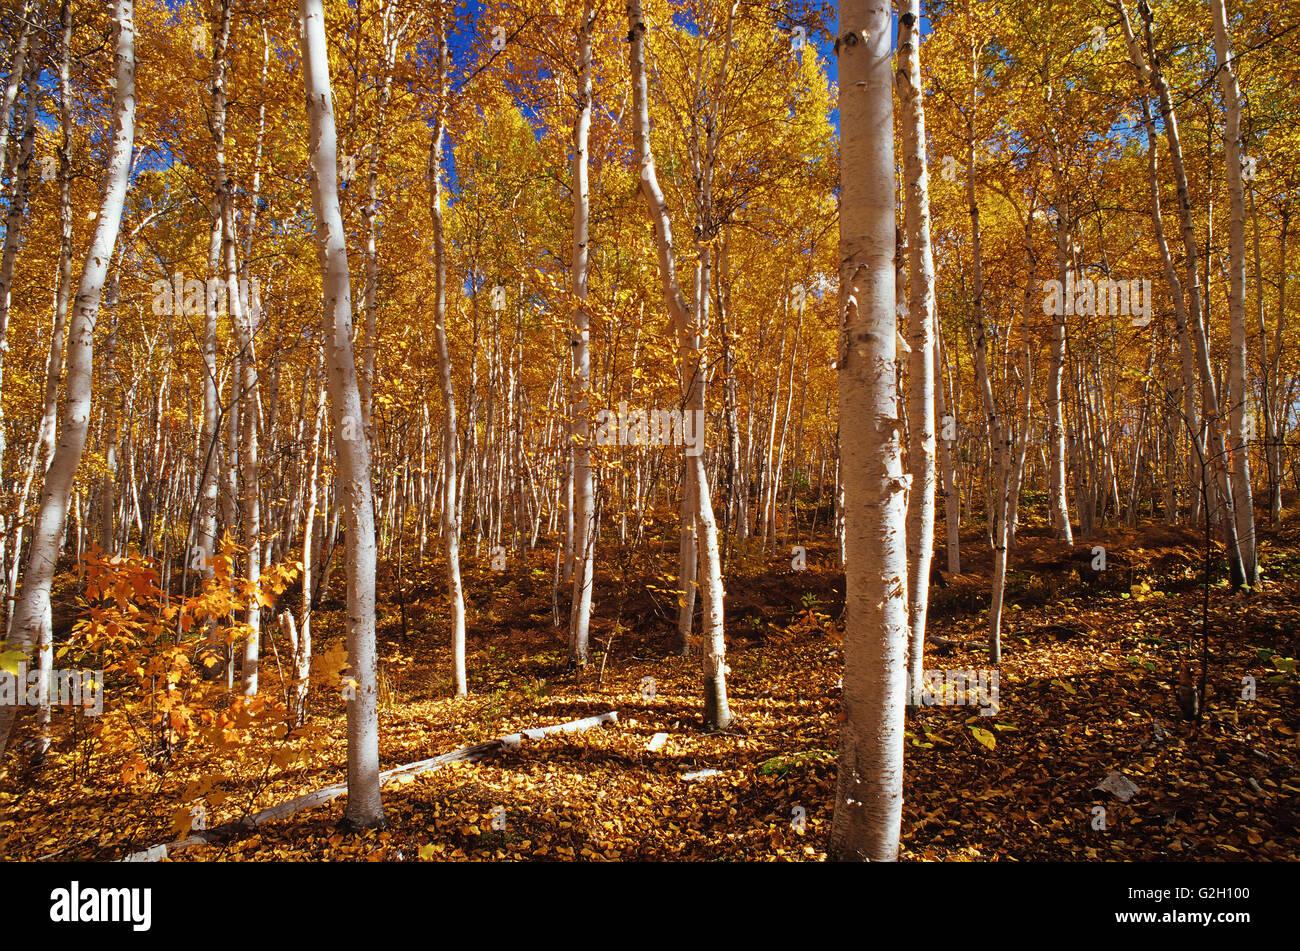 White birch trees in autumn colors Skead Ontario Canada - Stock Image